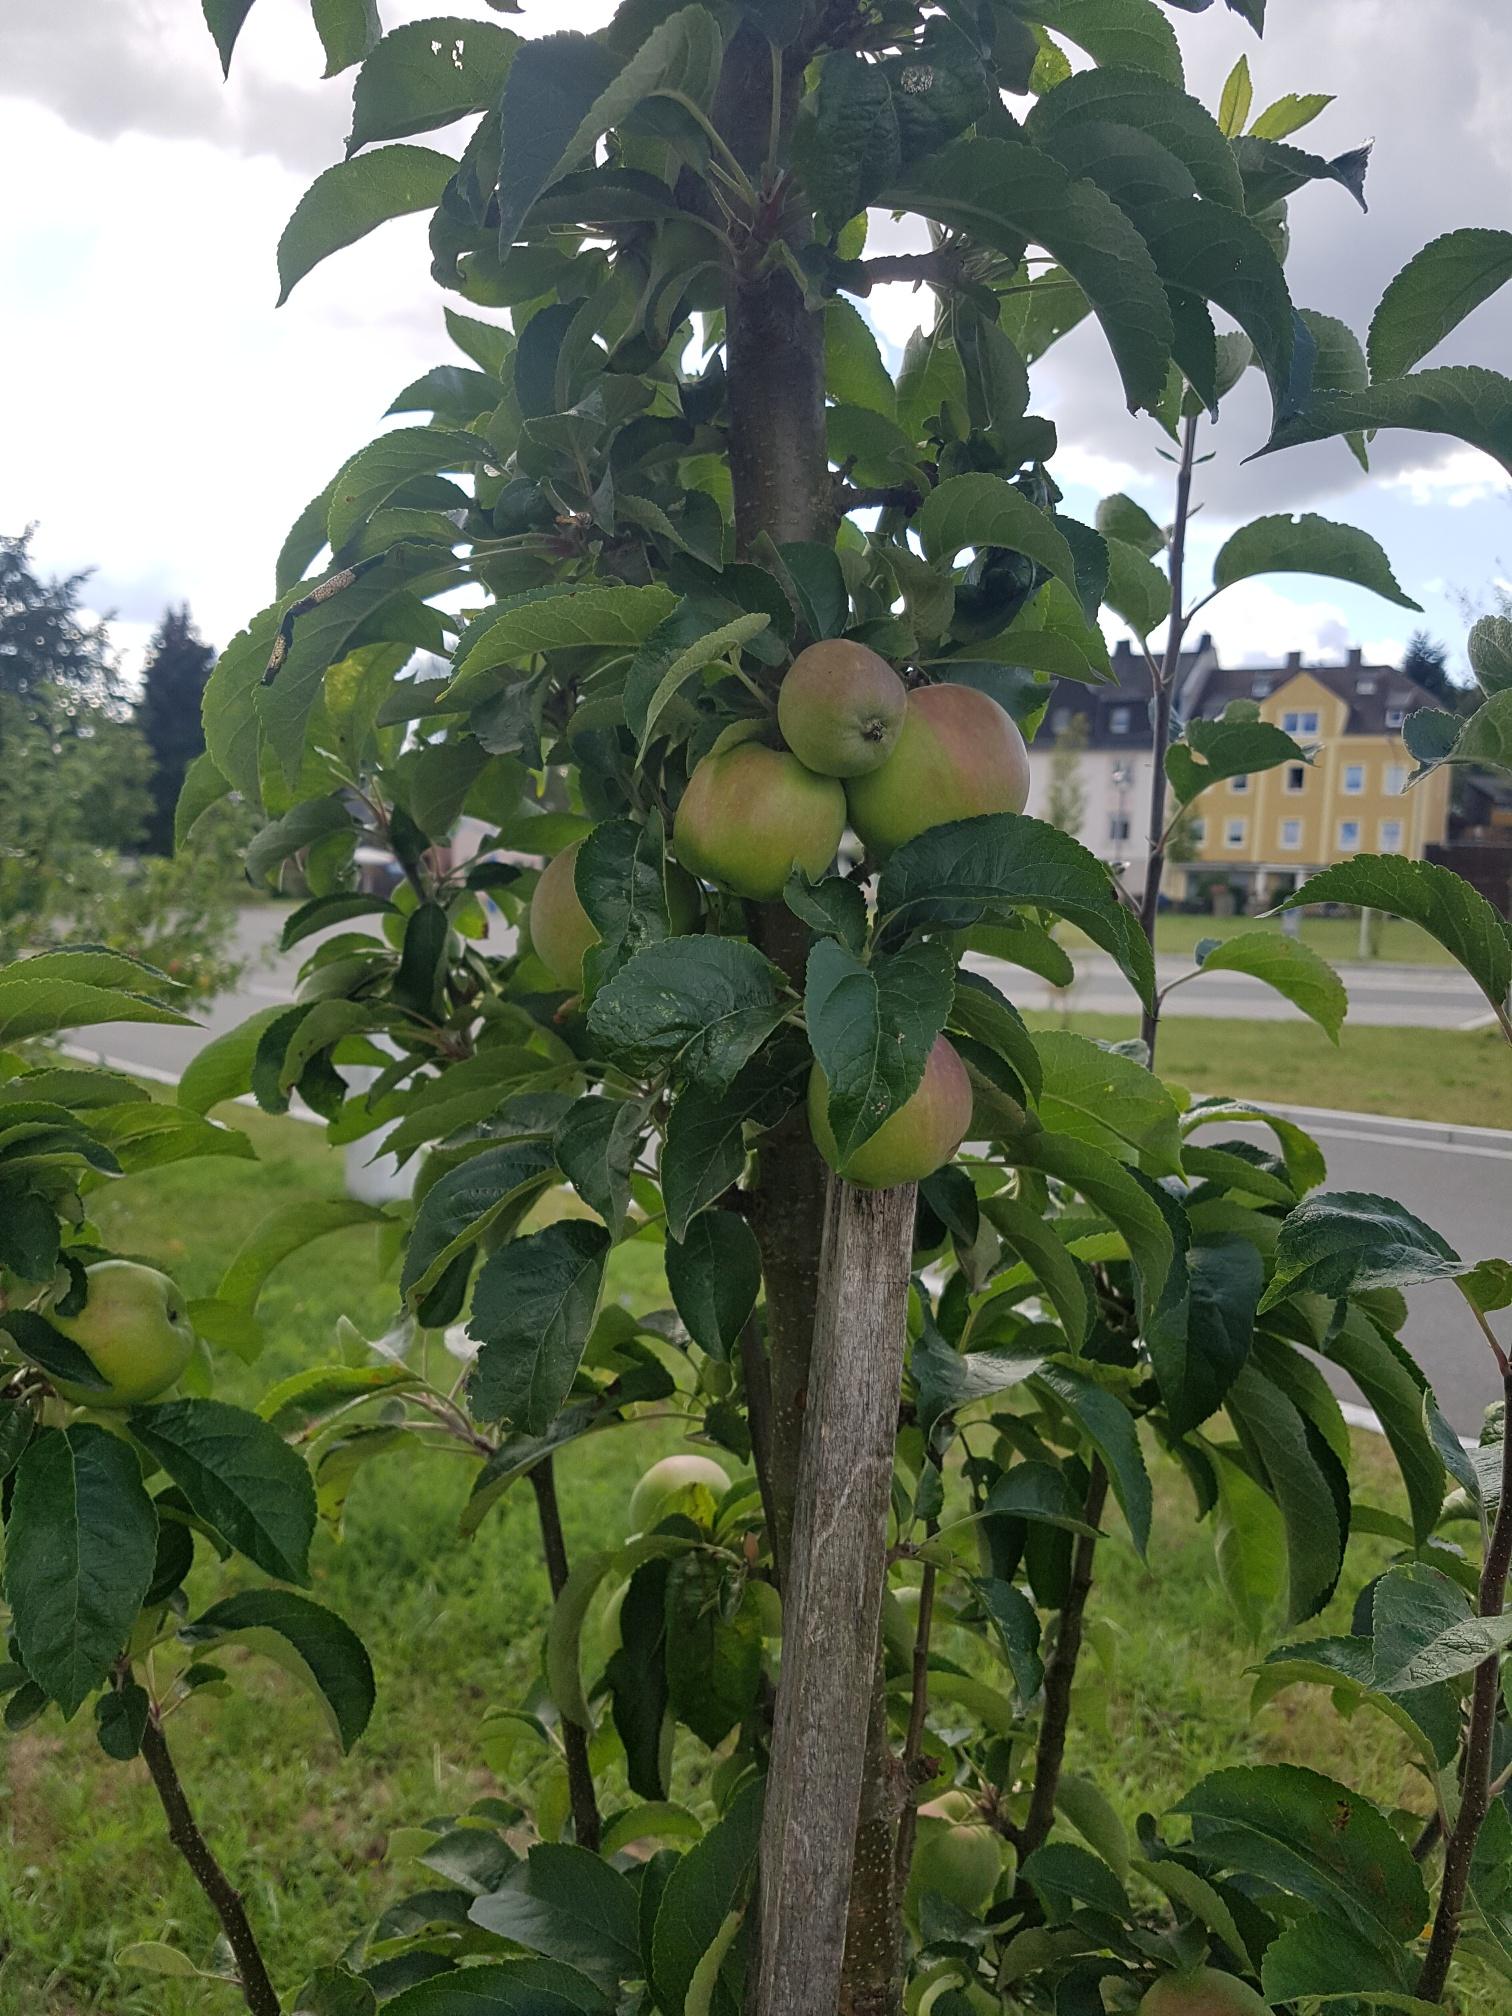 Leckere reife Äpfel